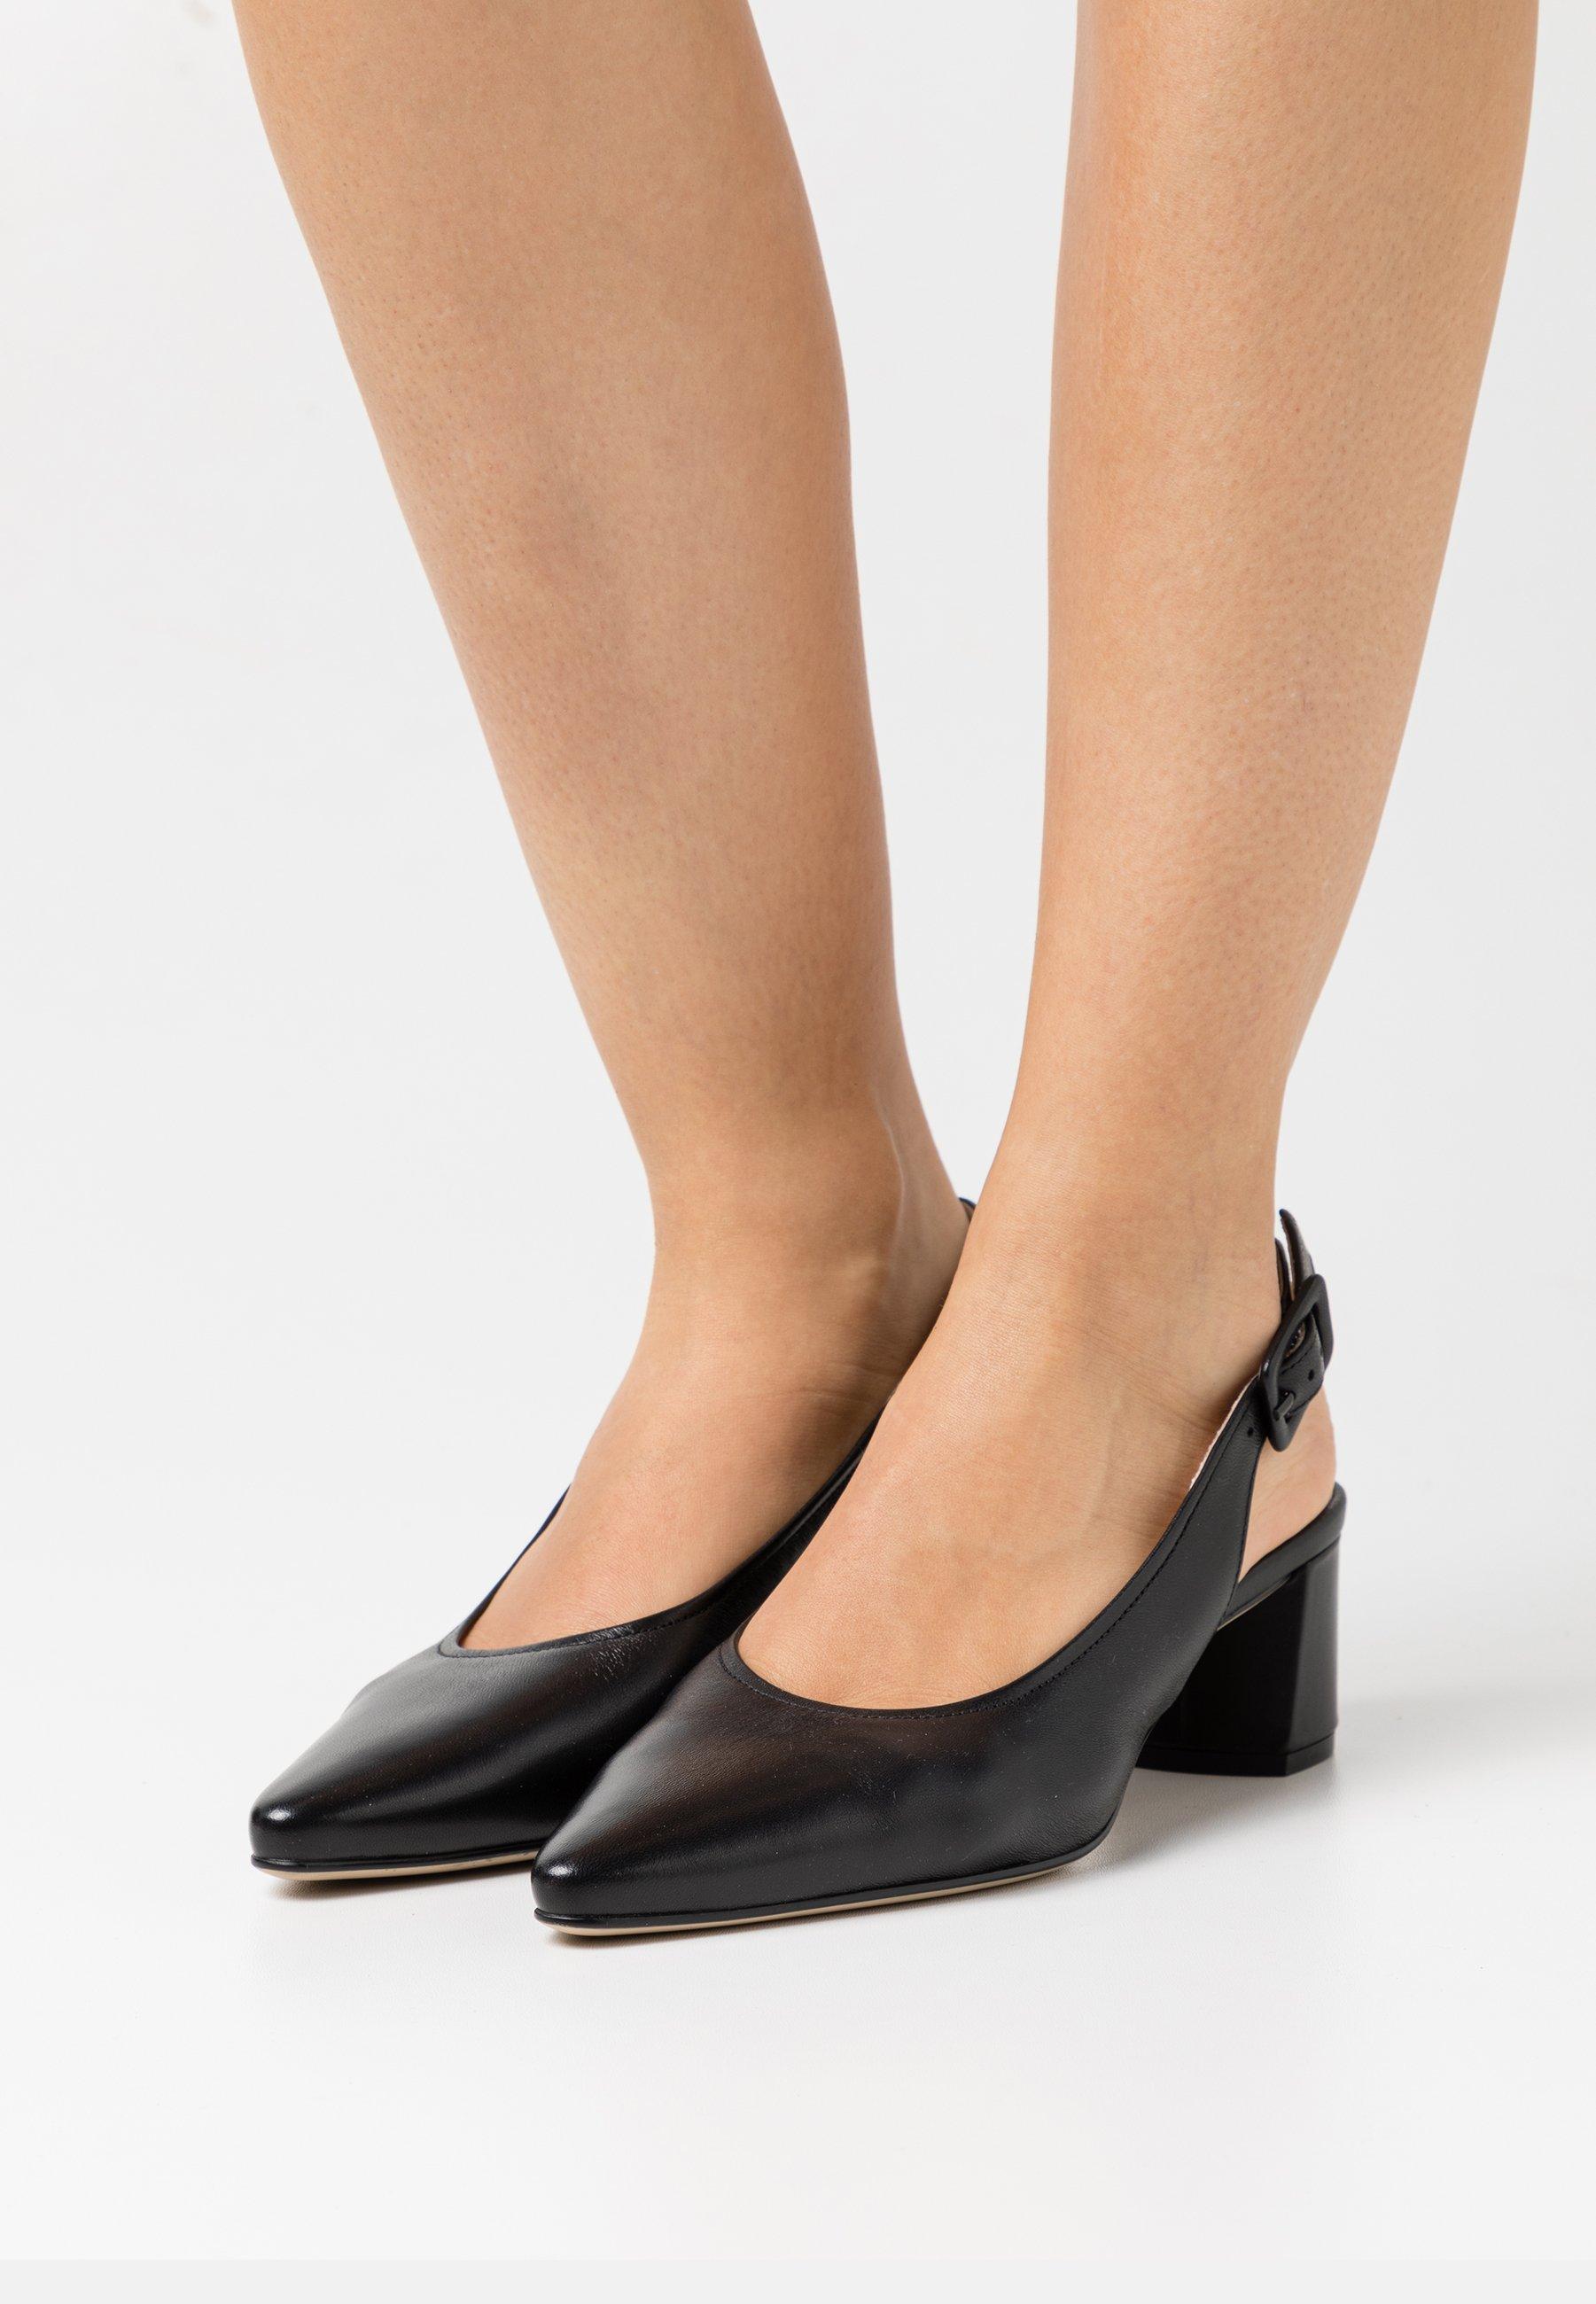 Women ETERNALLY - Classic heels - schwarz